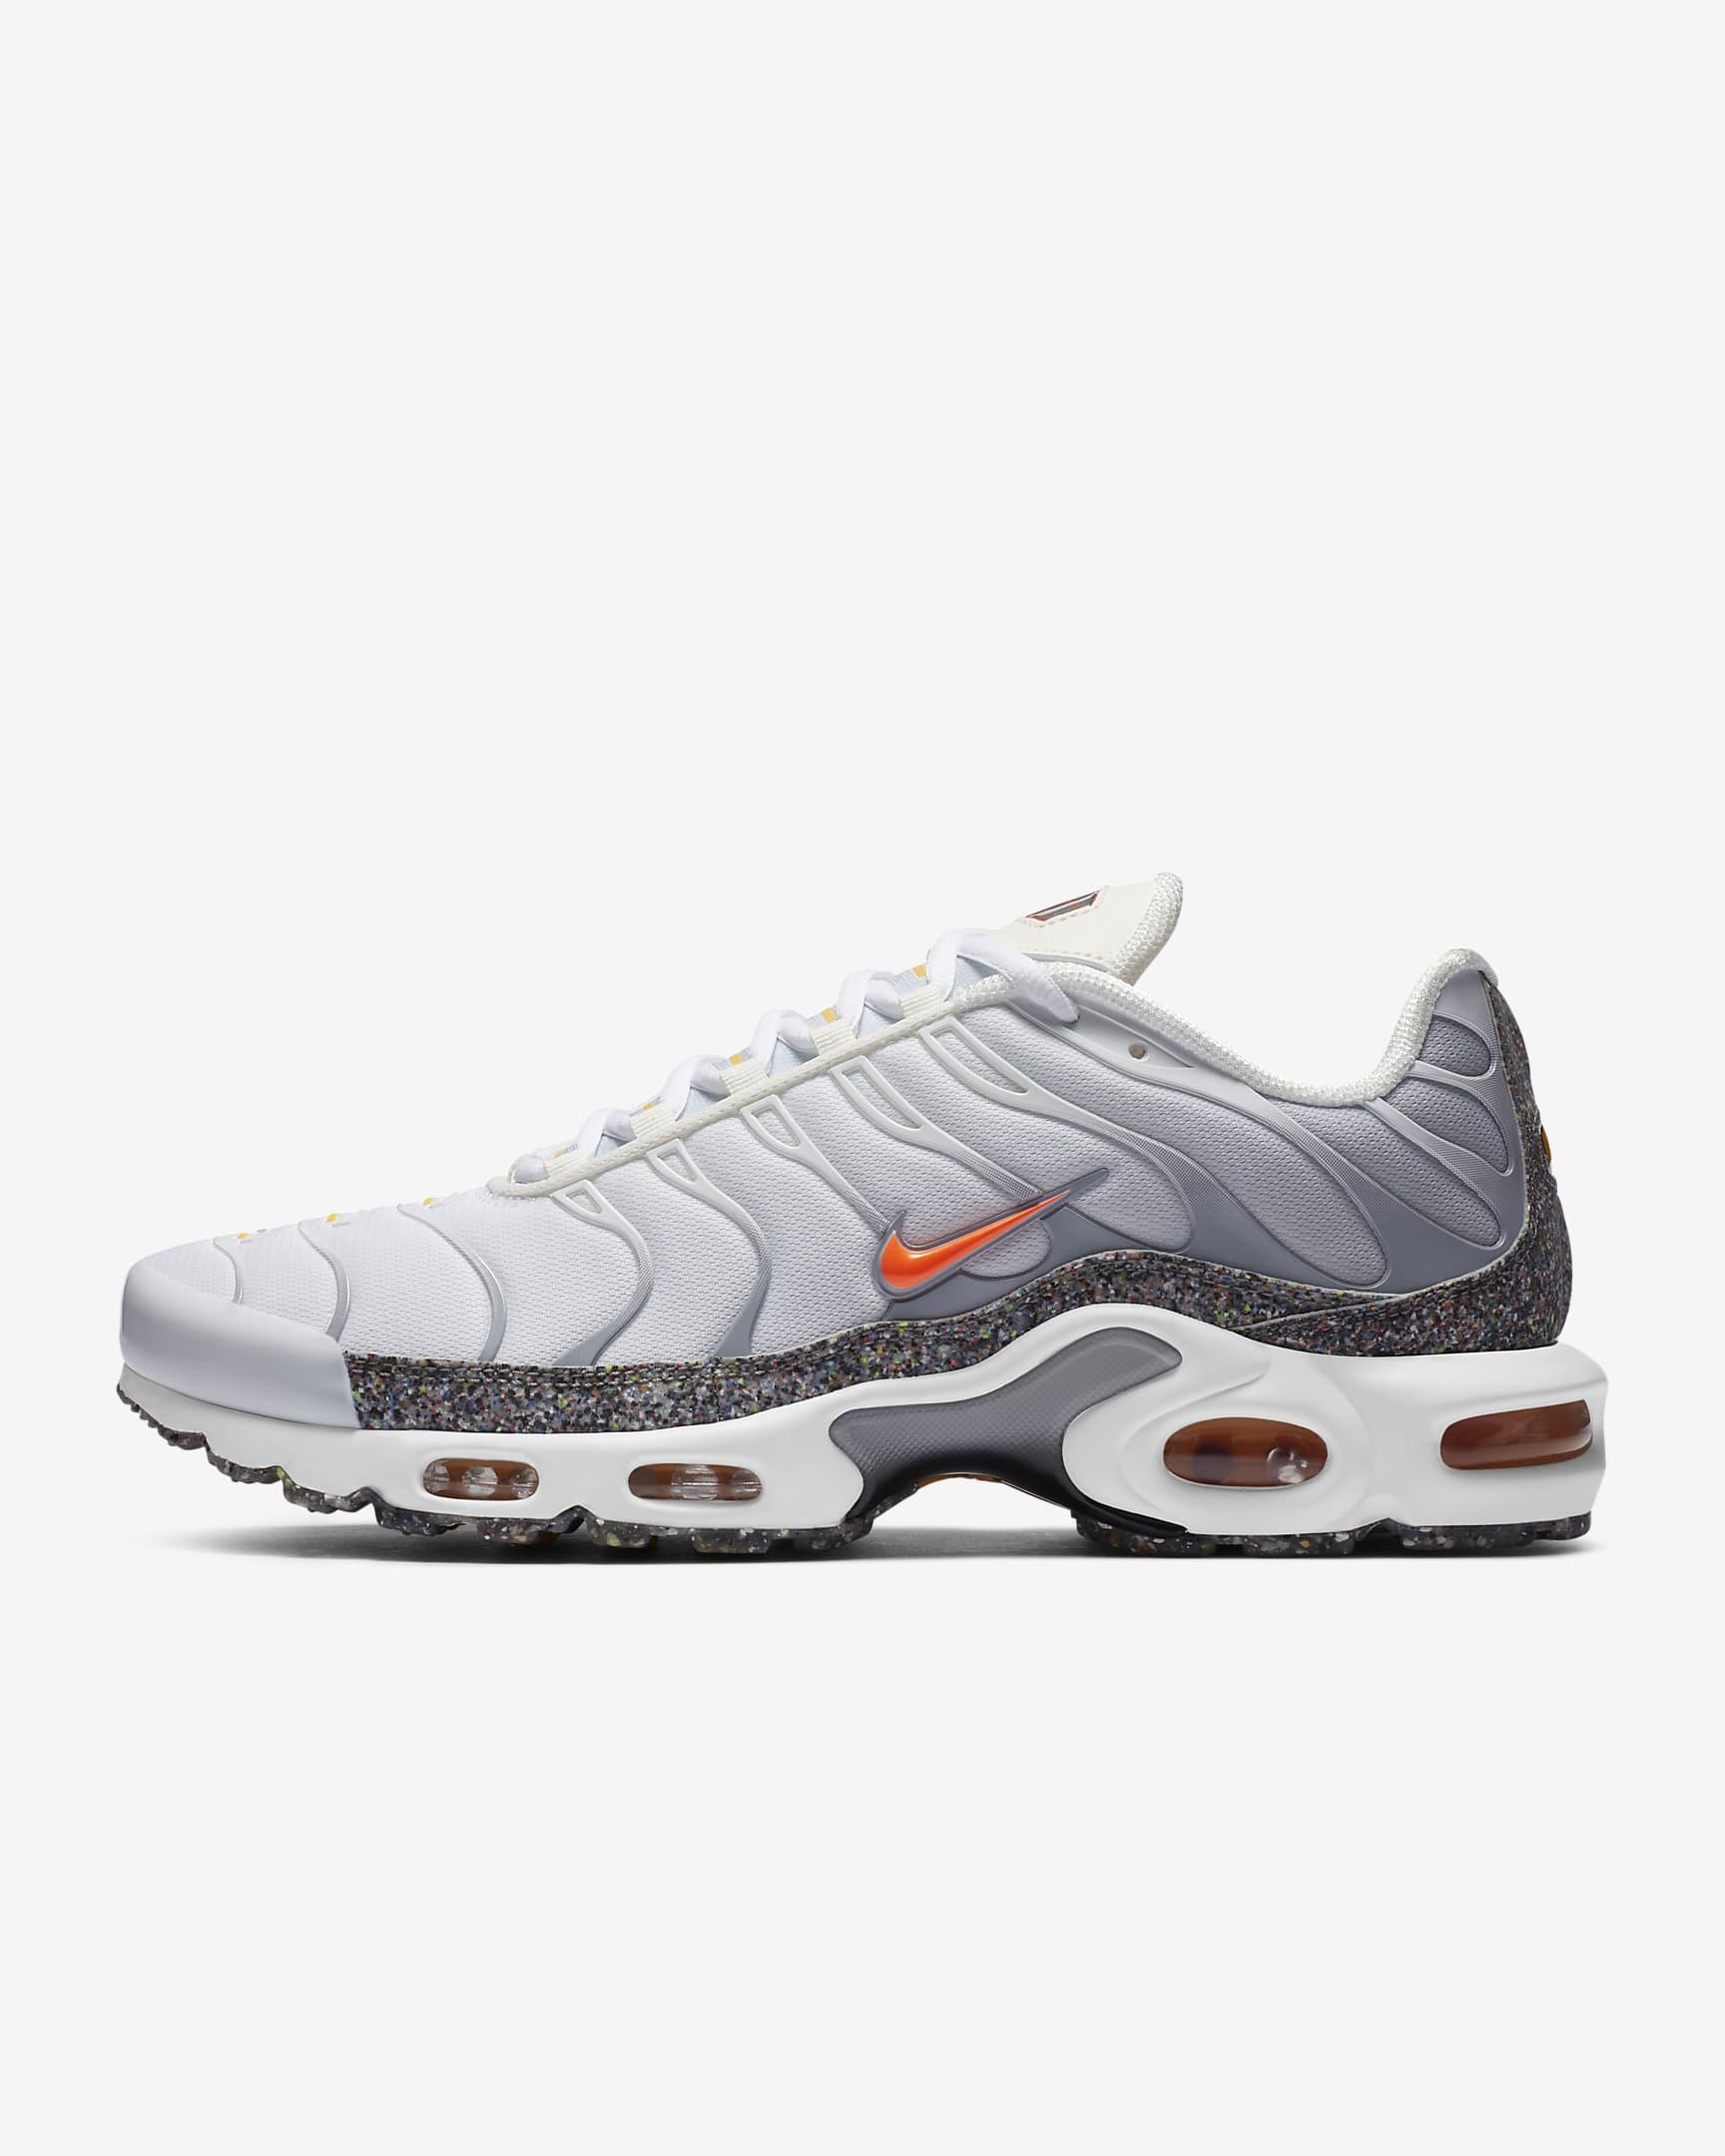 nike air max plus, sneakers, korting, kortingscode, bts25